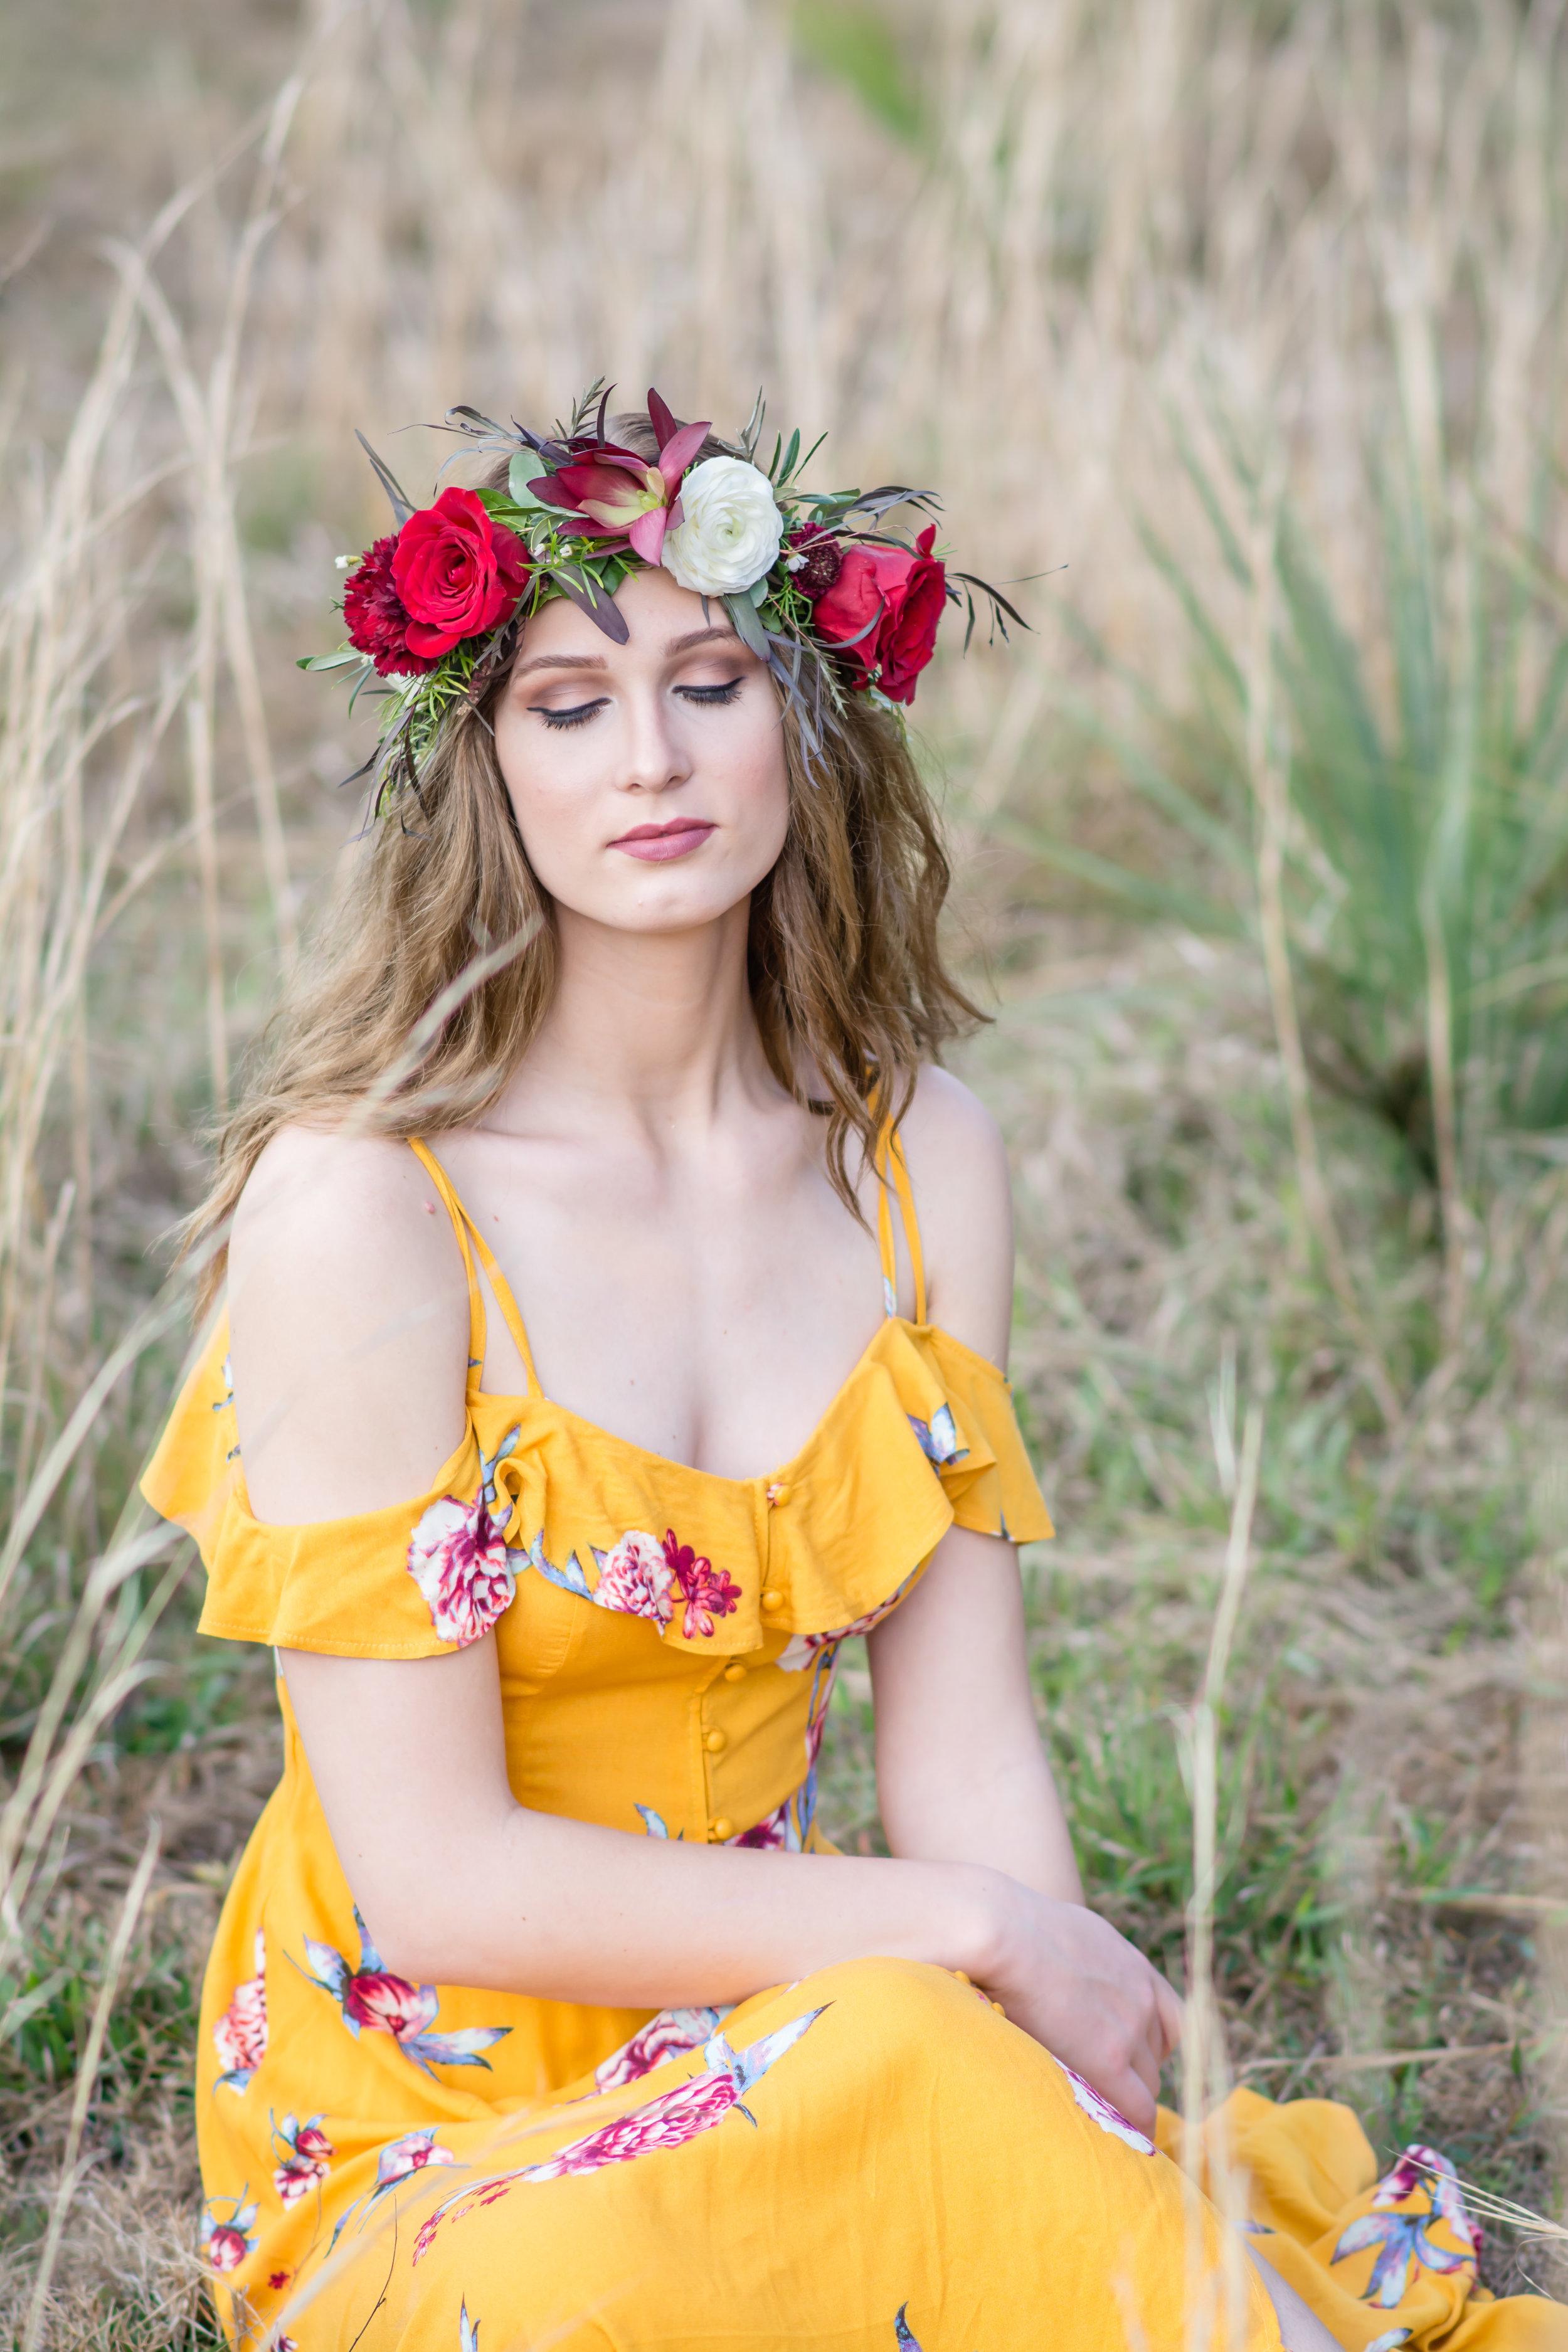 floral-headpiece-fashion-photoshoot-geneva-central-florida-photographer-yanitza-ninett-41.jpg